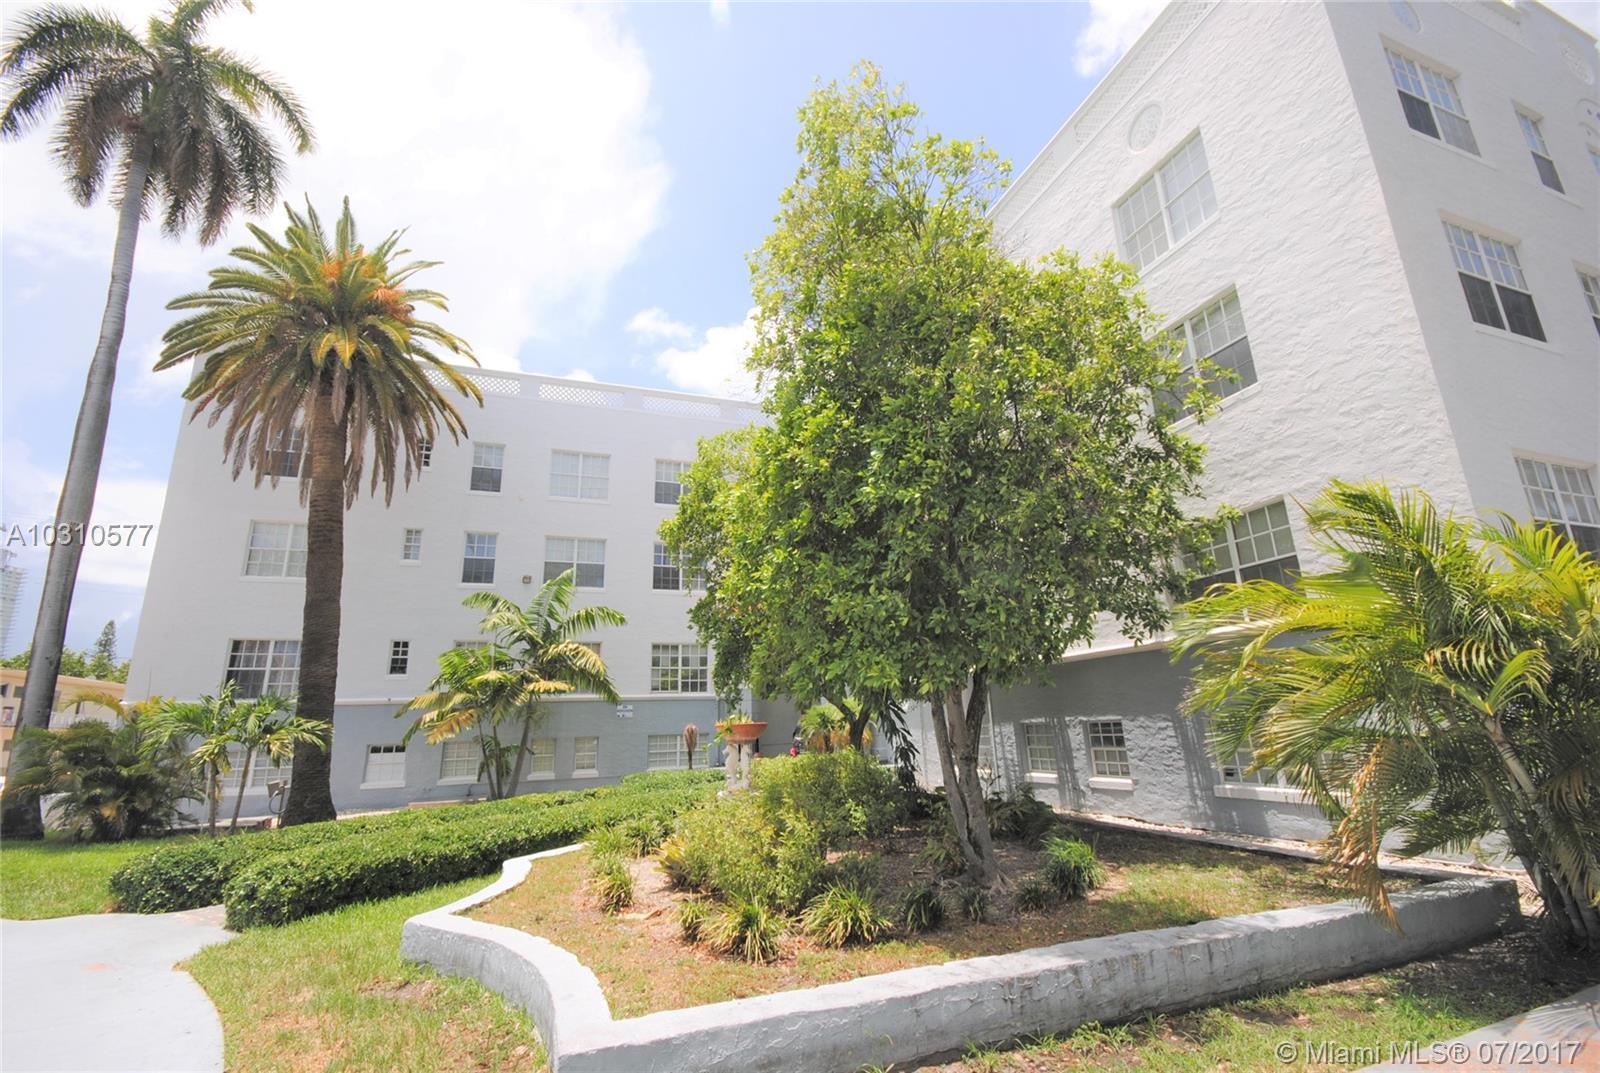 700 Euclid Ave # 402, Miami Beach, FL 33139